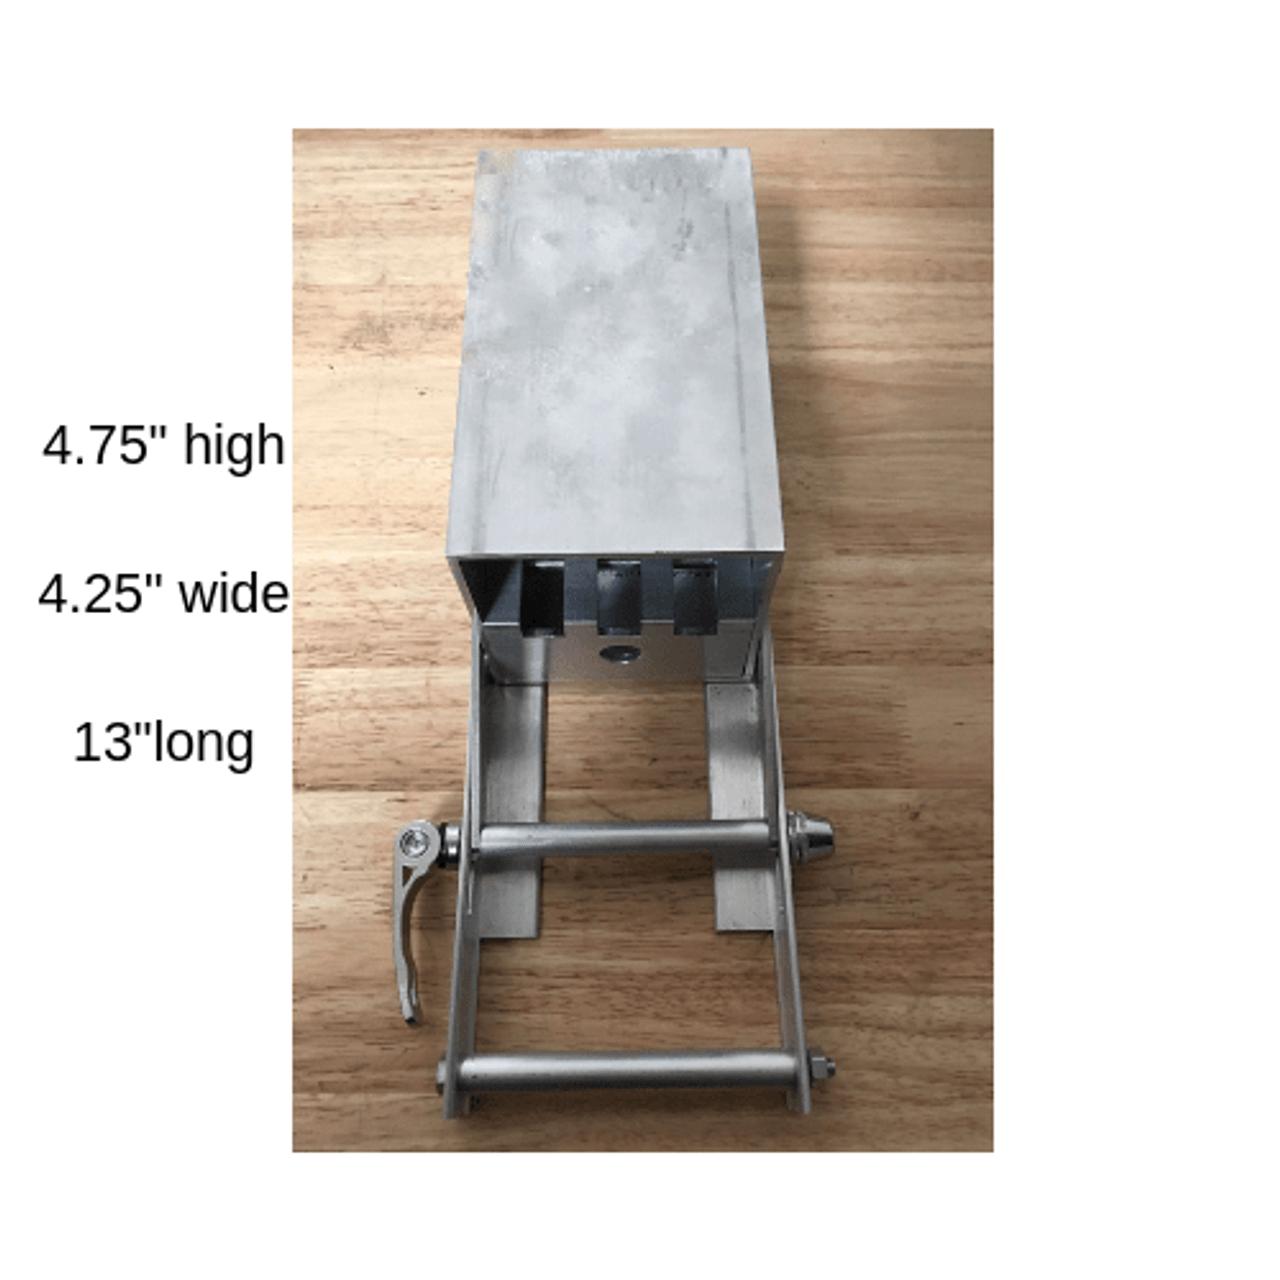 SB100-Portable-Soldering-Furnace-Box-Measurements